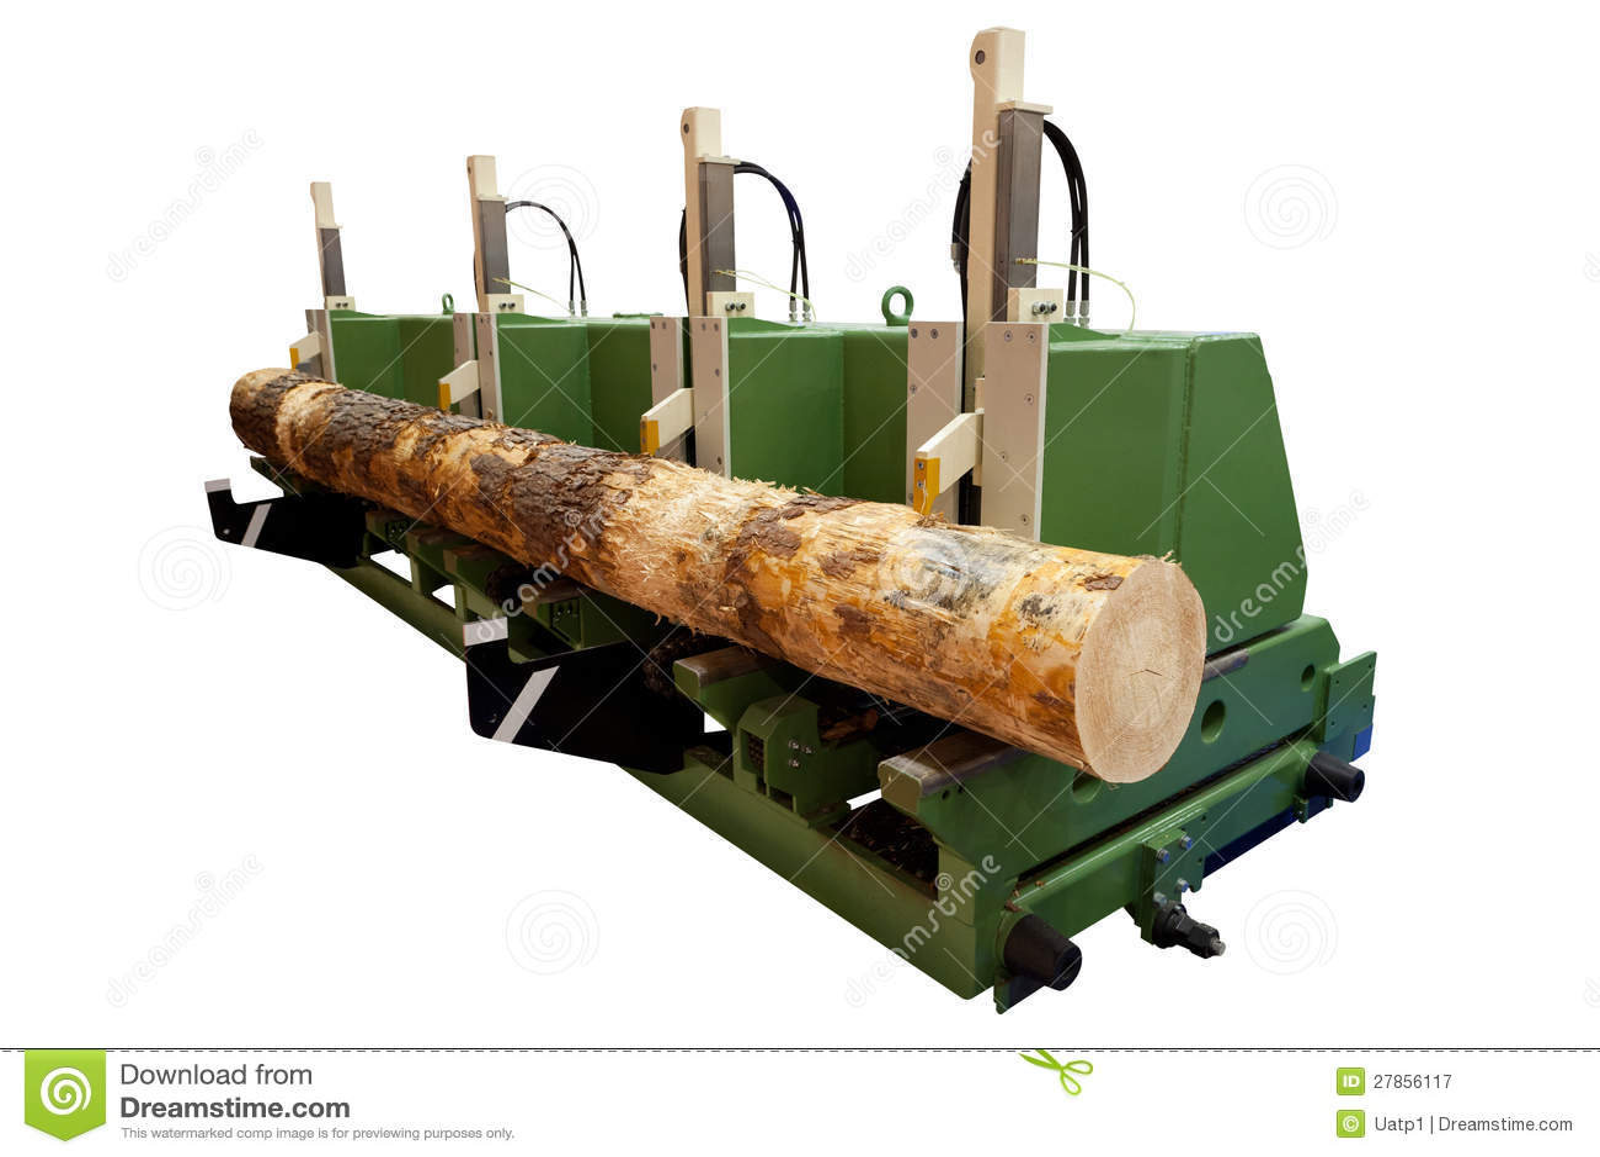 Woodworking fabryka